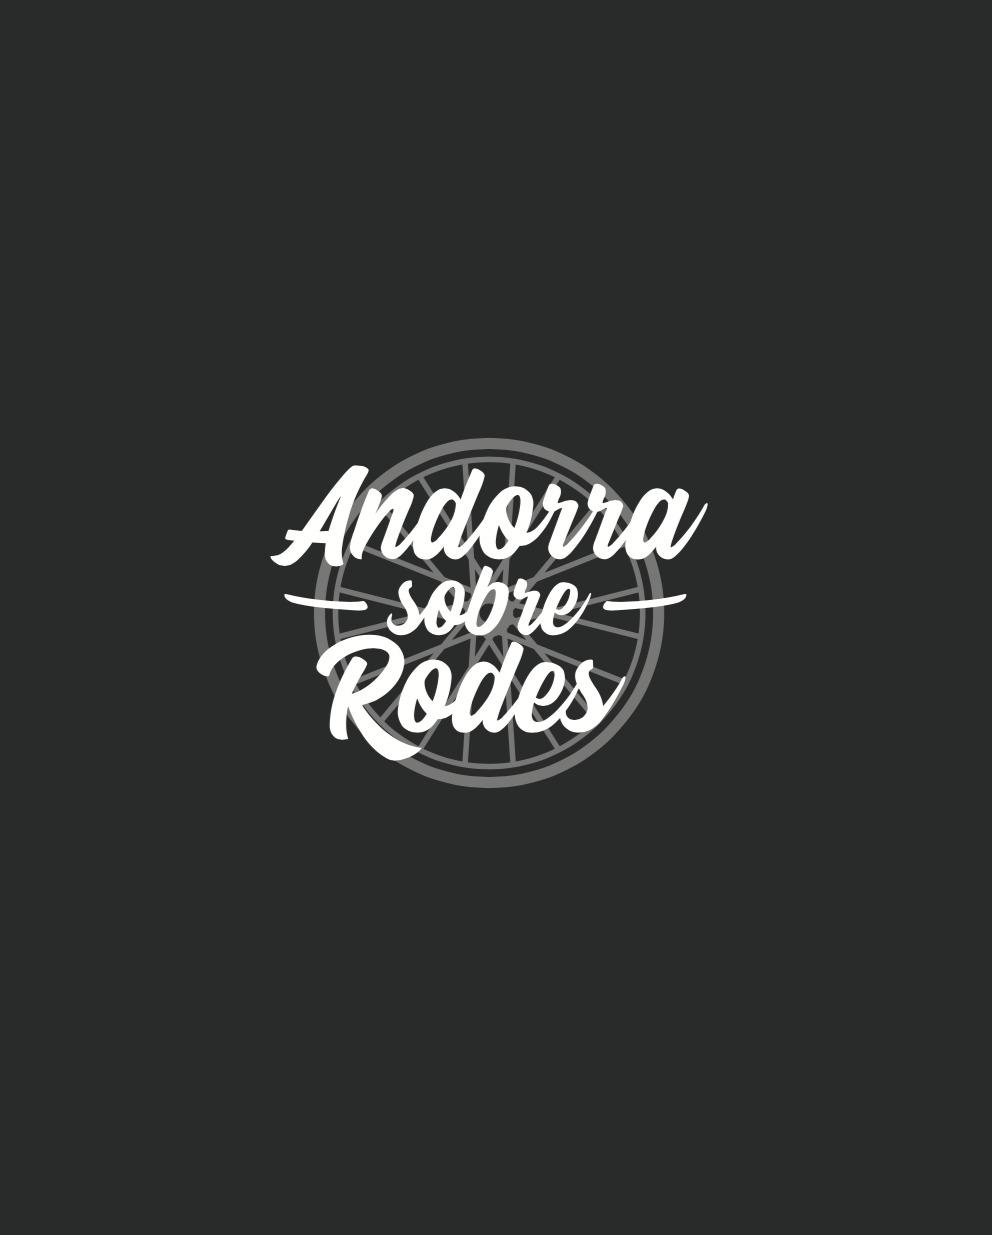 Andorra sobre rodes